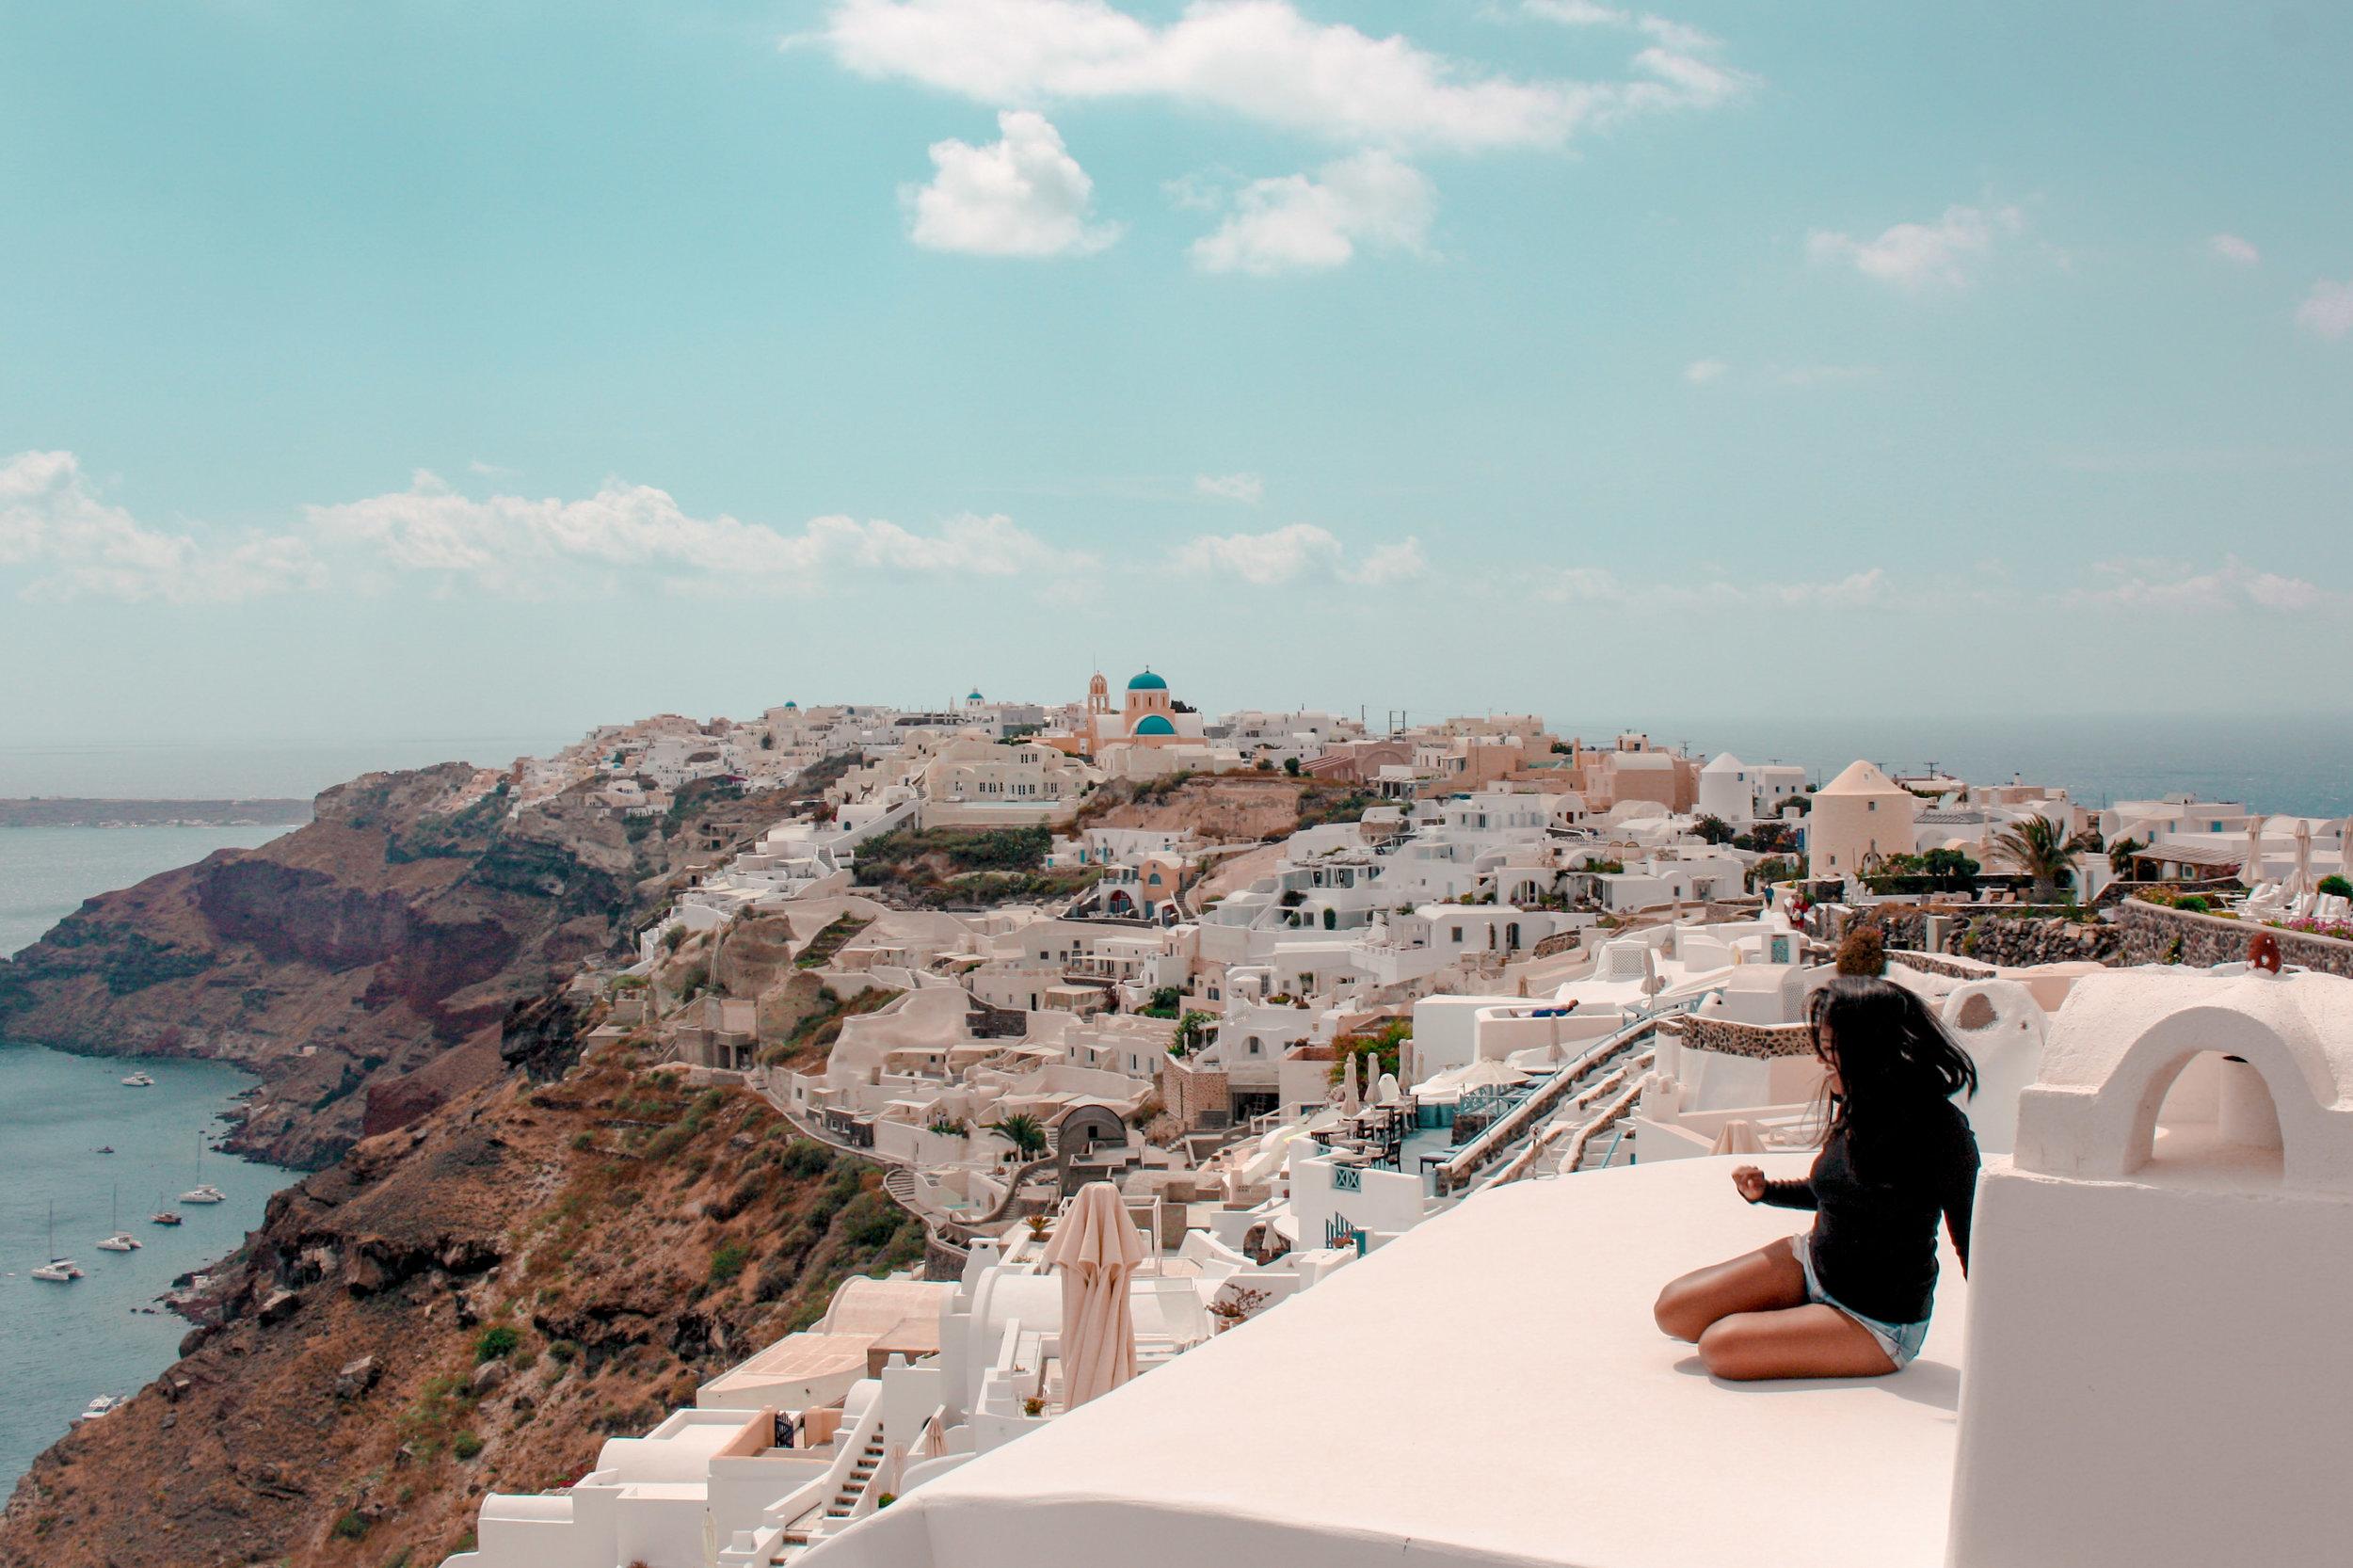 Santorini_thekikogirl_03